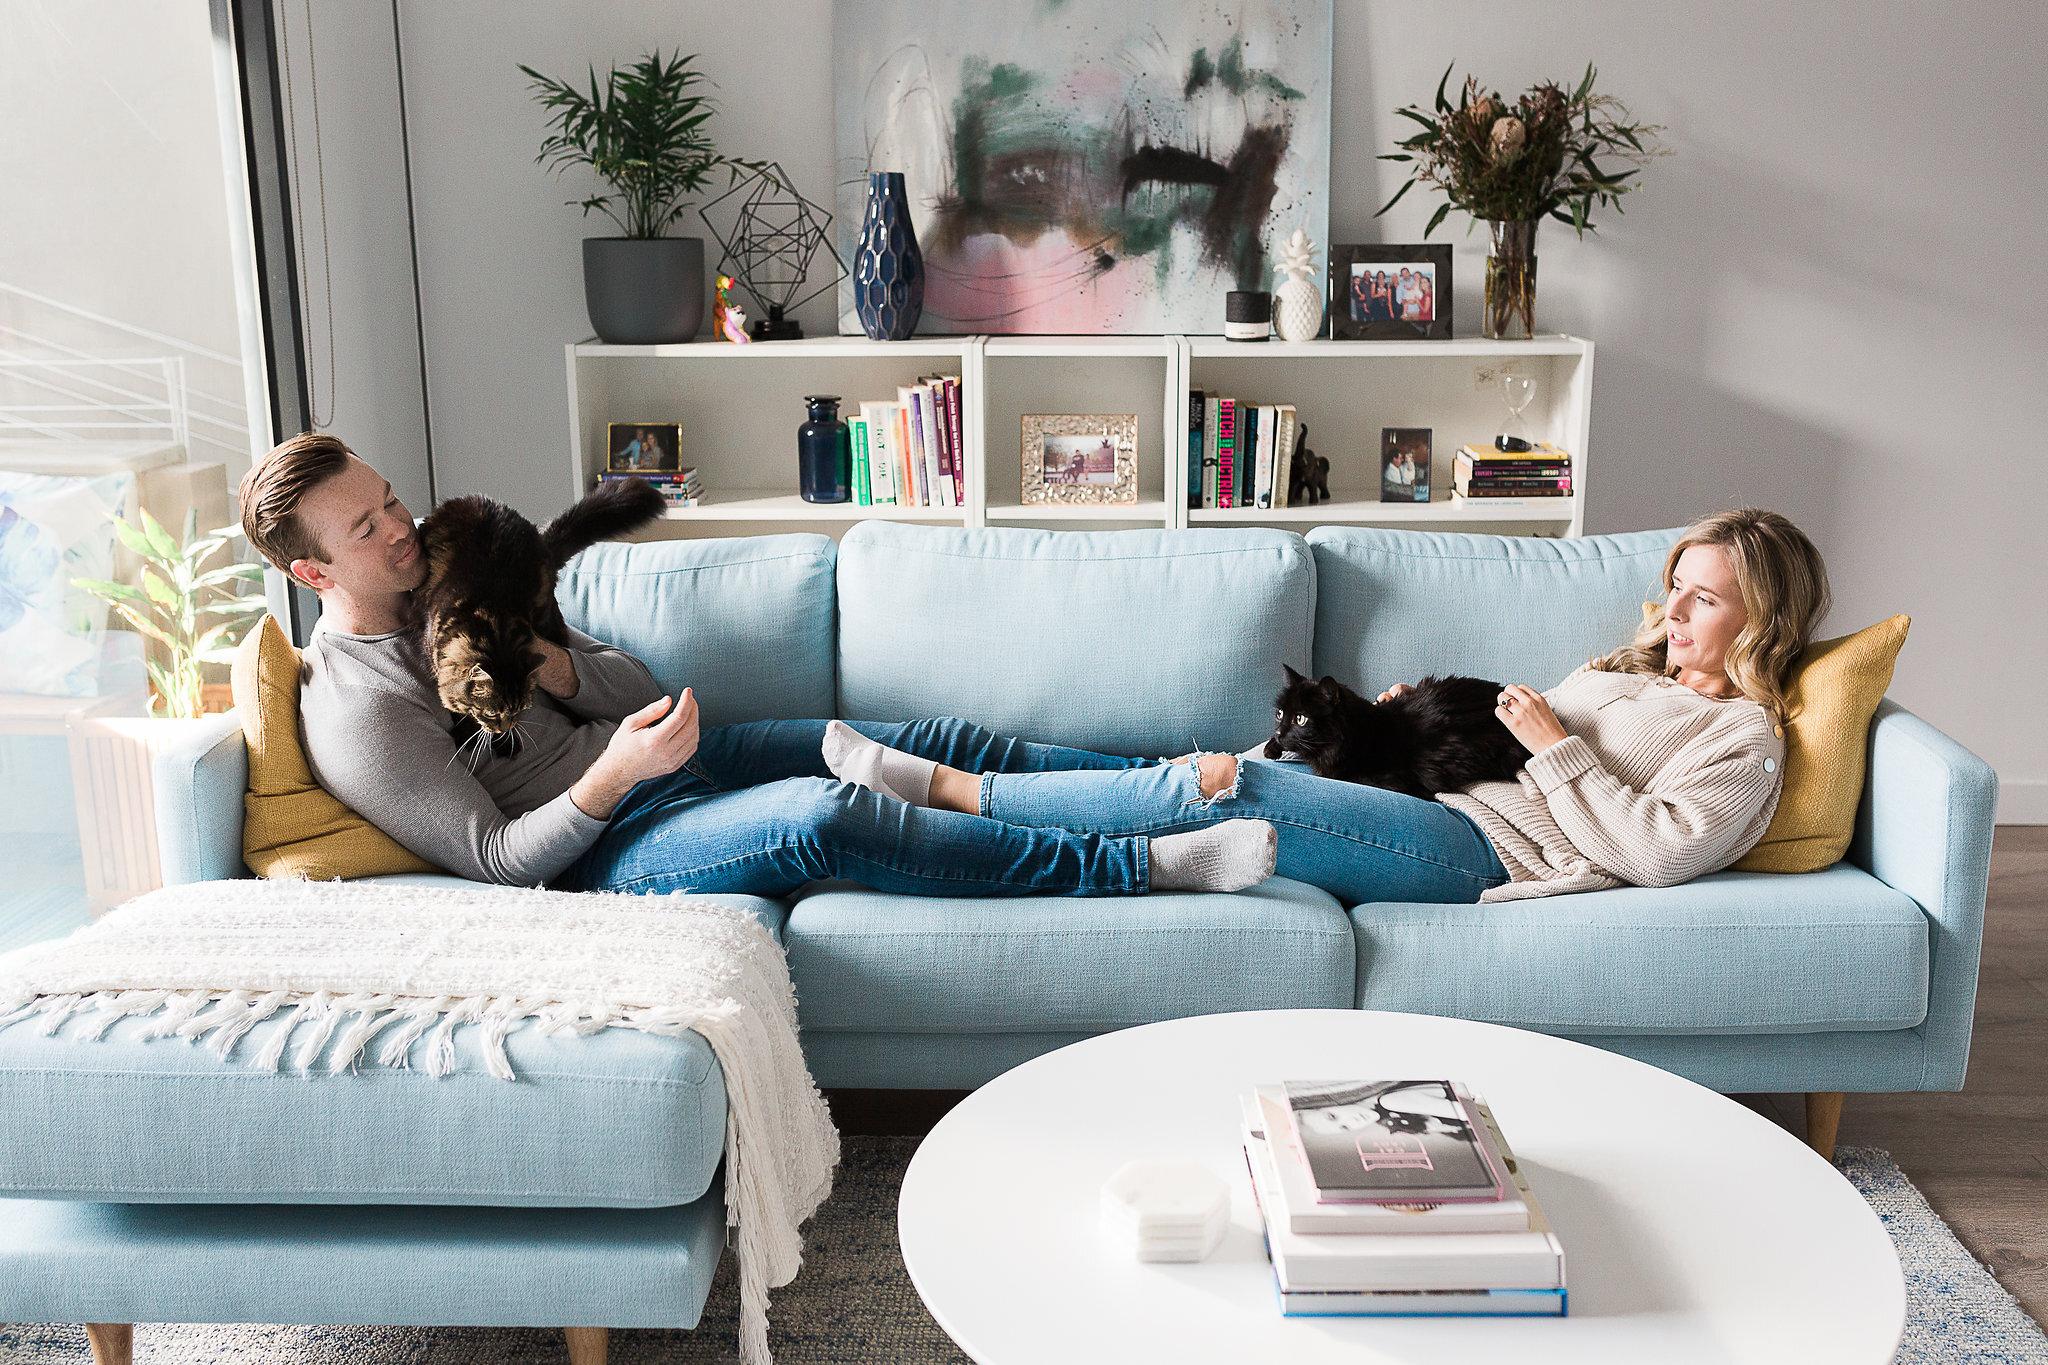 melbourne-home-engagement-3.jpg